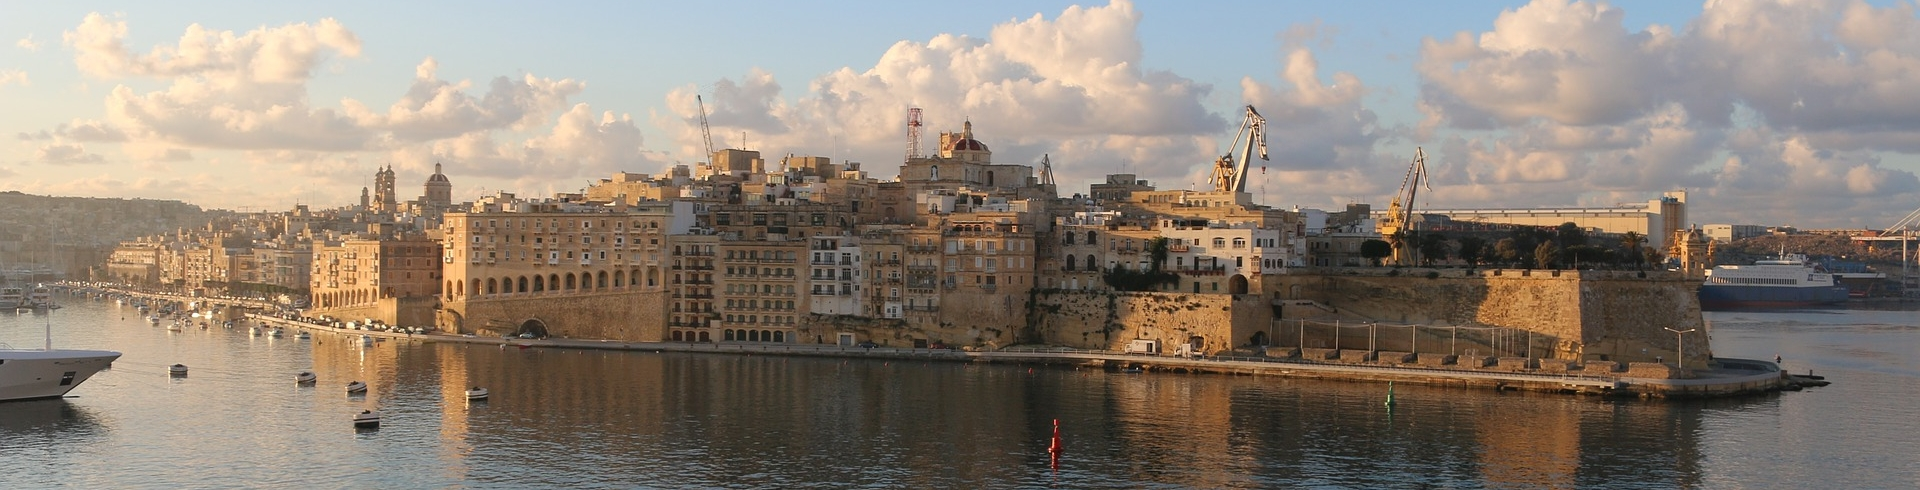 Maltas neue Luxus-Hotels